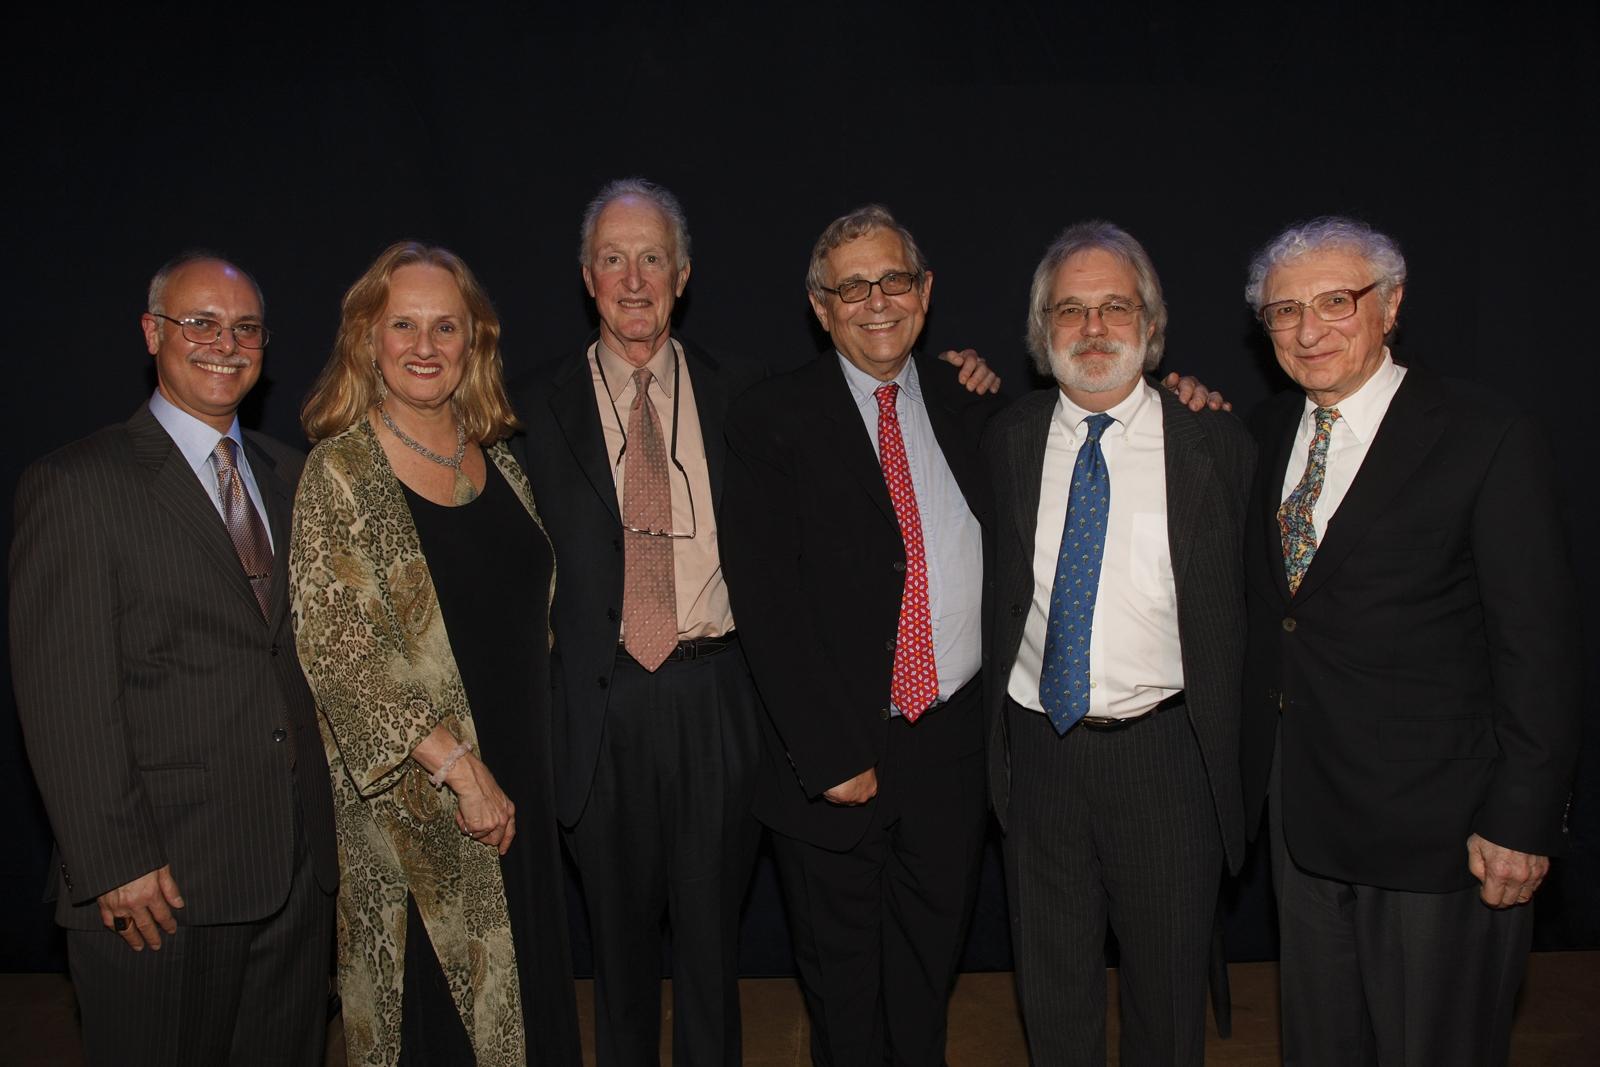 #3 Daniel De Siena, Encompass Board Chairman, Nancy Rhodes, Encompass Artistic Director, David Shire, Richard Maltby Jr., John Weidman, Sheldon Harnick.JPG